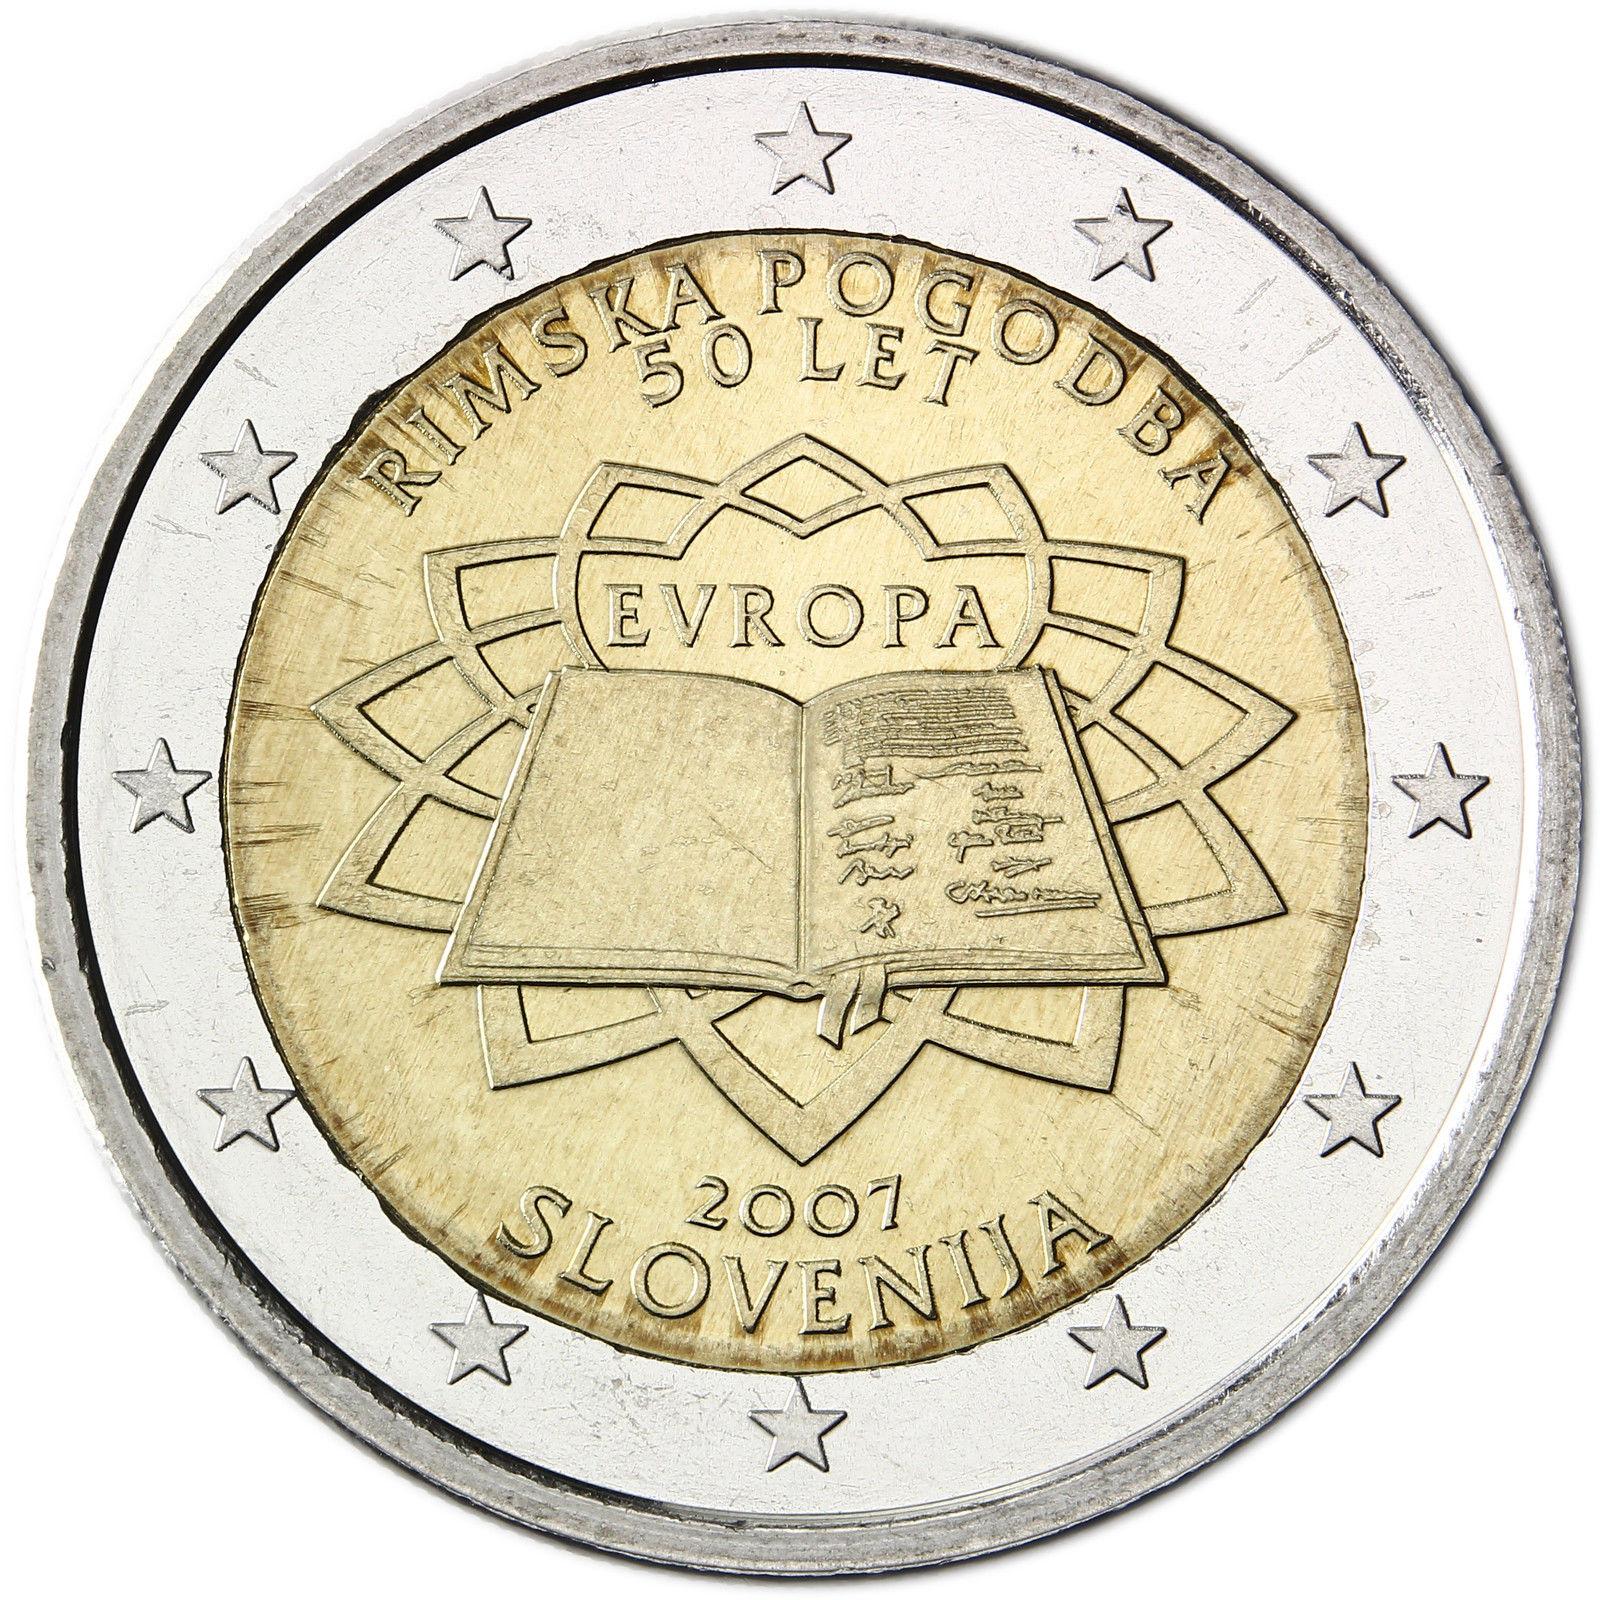 slovenia 2 euro 2007 50th anniversary of the treaty of. Black Bedroom Furniture Sets. Home Design Ideas